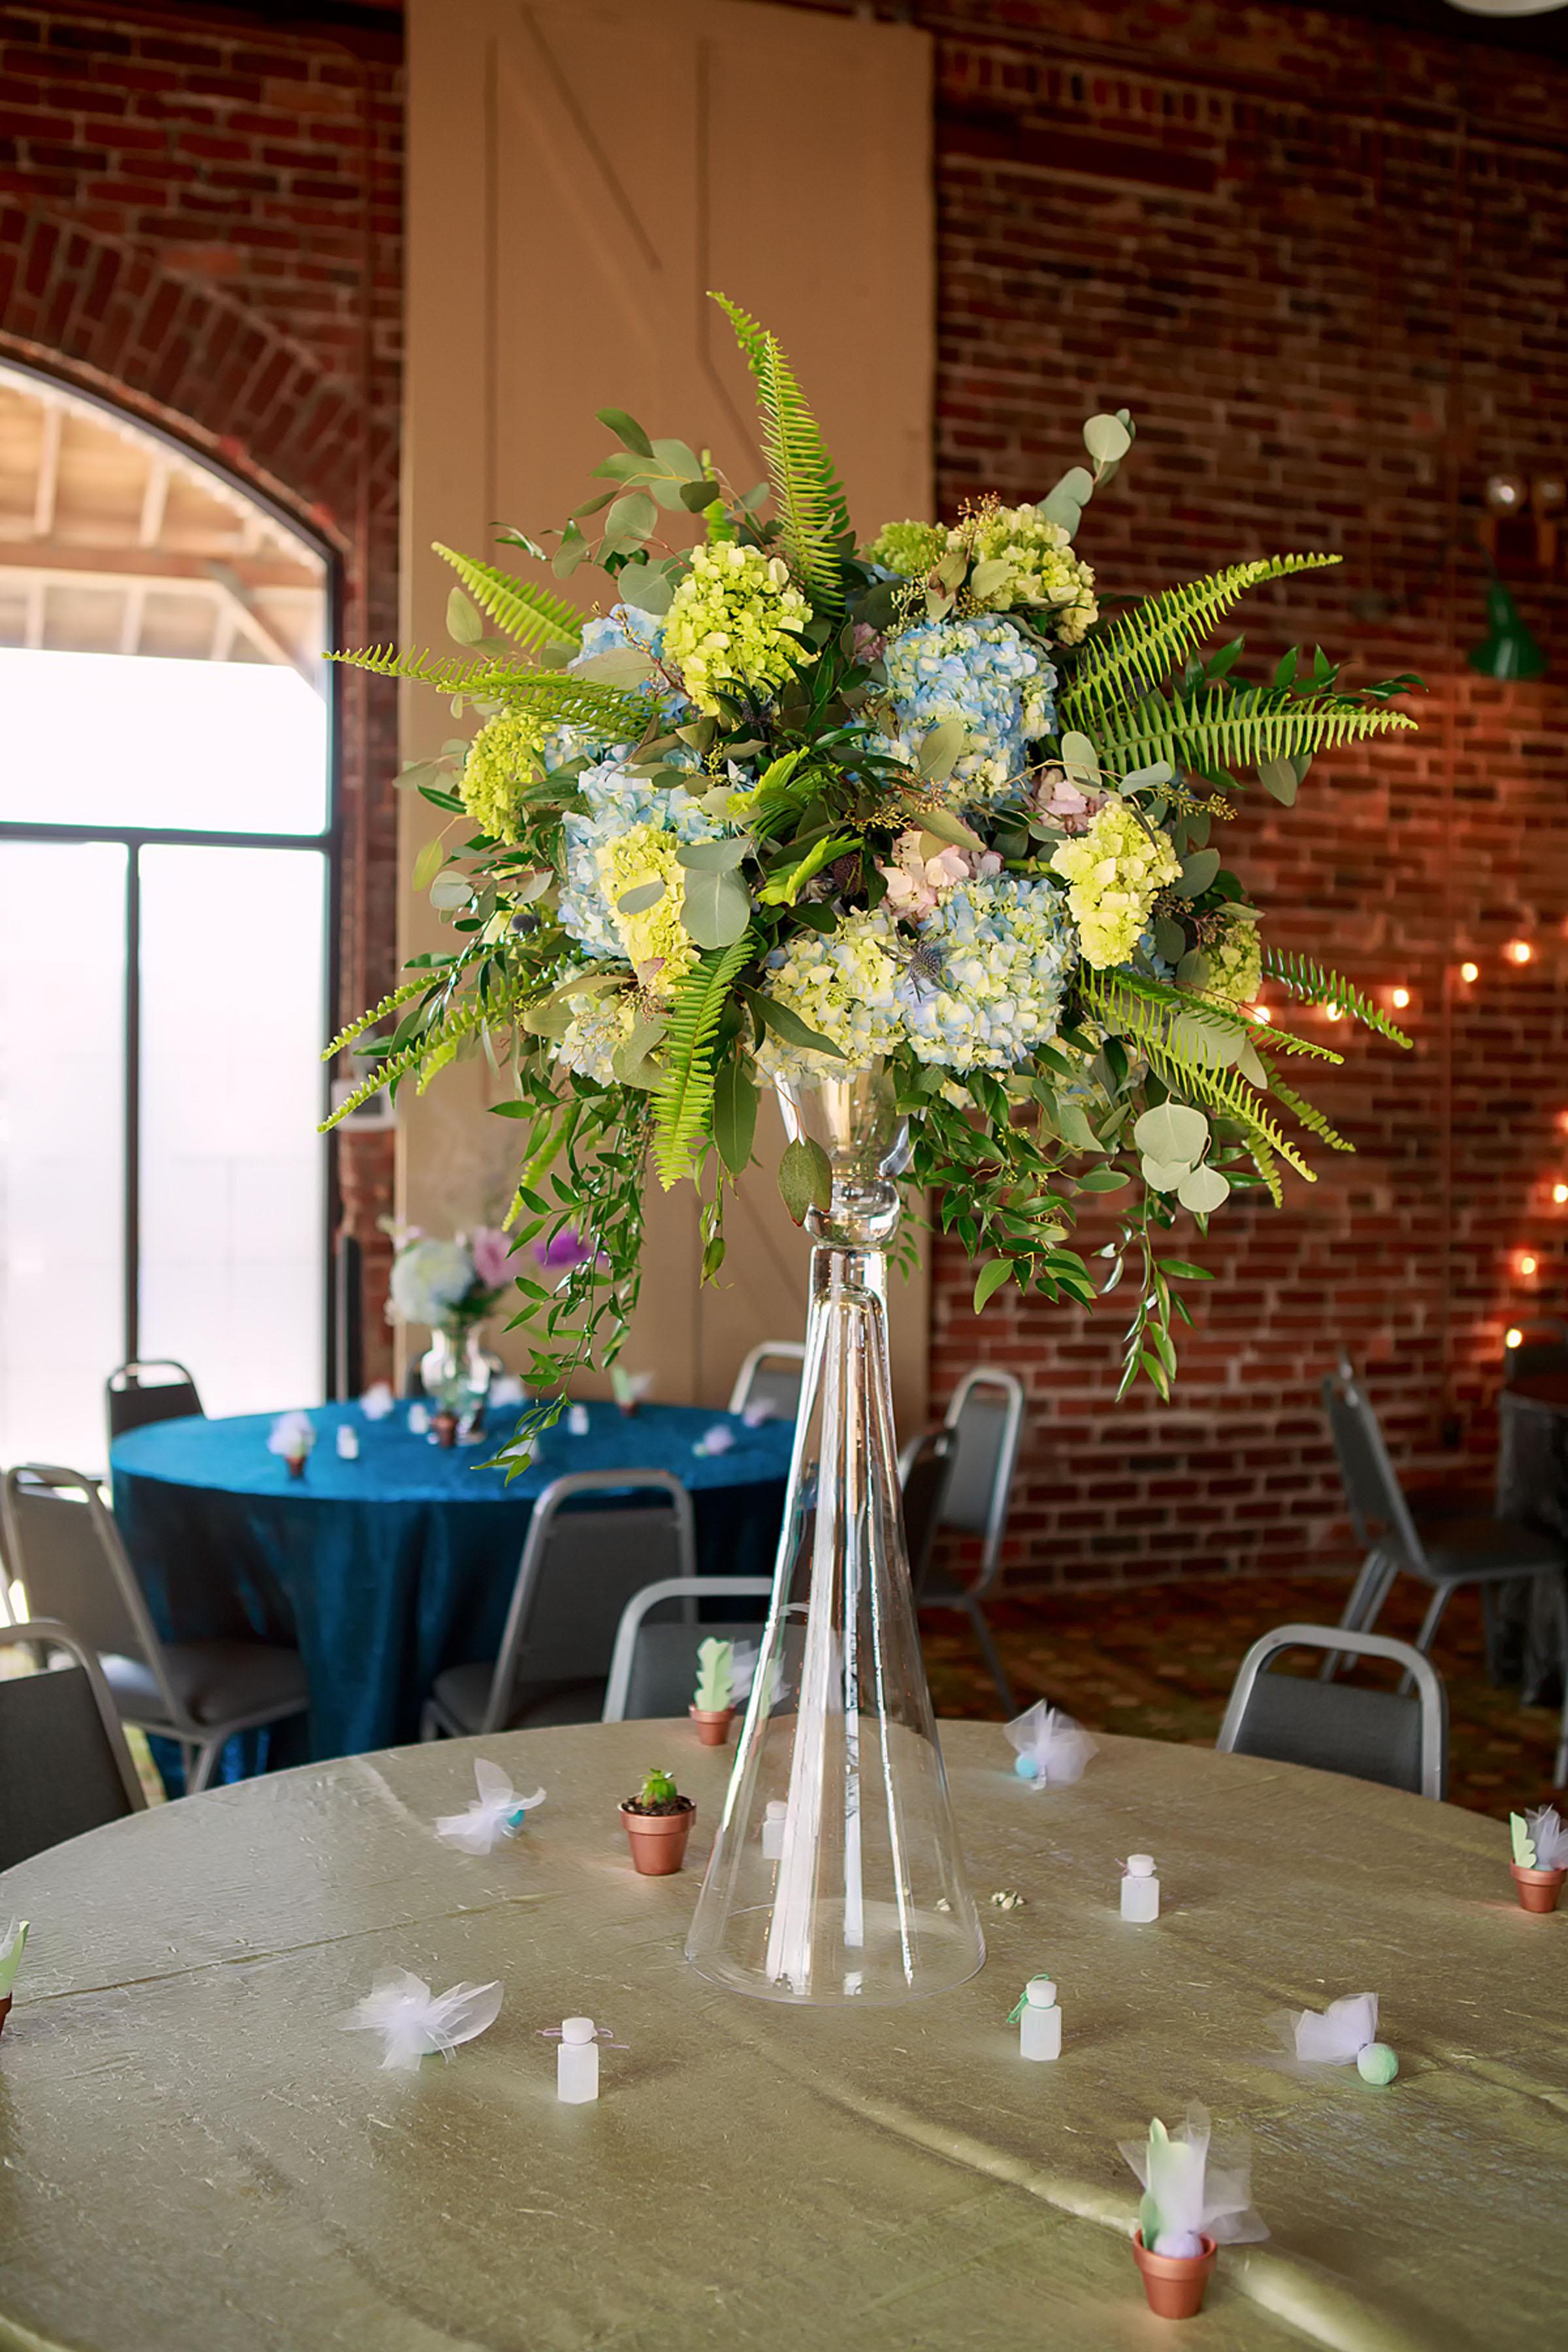 North_Carolina_Wedding_Photographer_Tiffany_Abruzzo_Reception_014.jpg